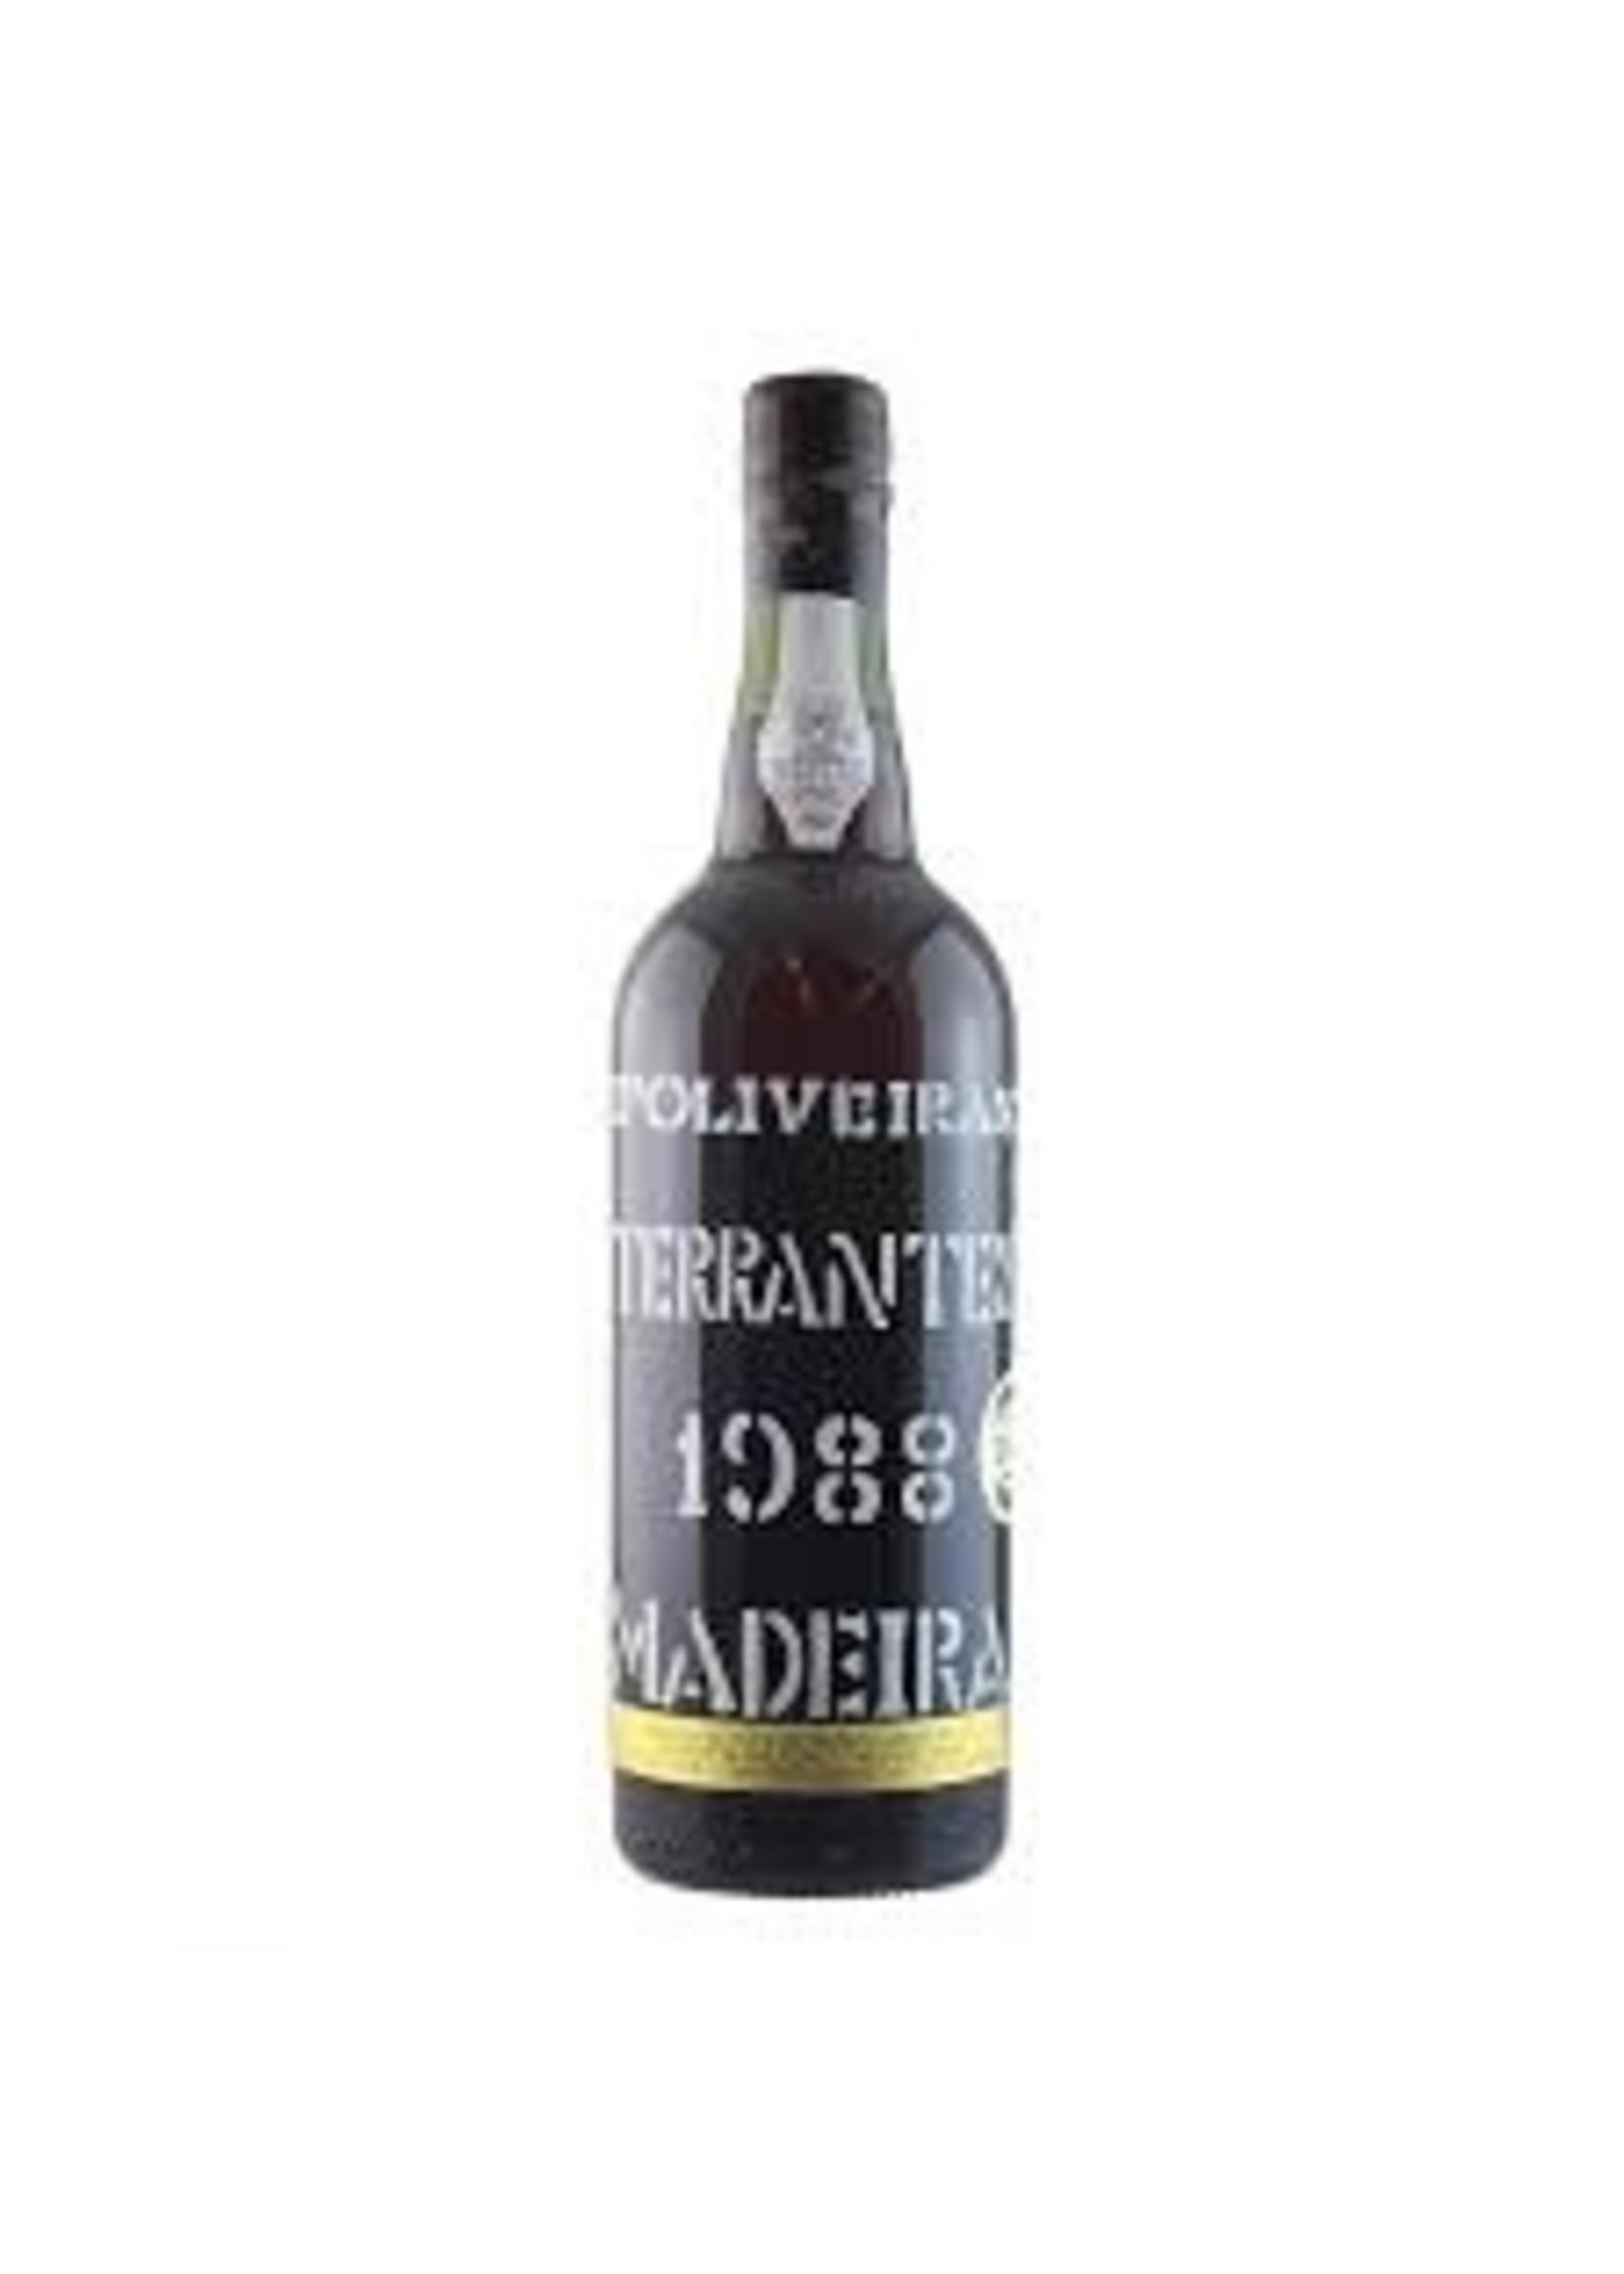 D'Oliveira 1988 Terrantez Maderia 750ml